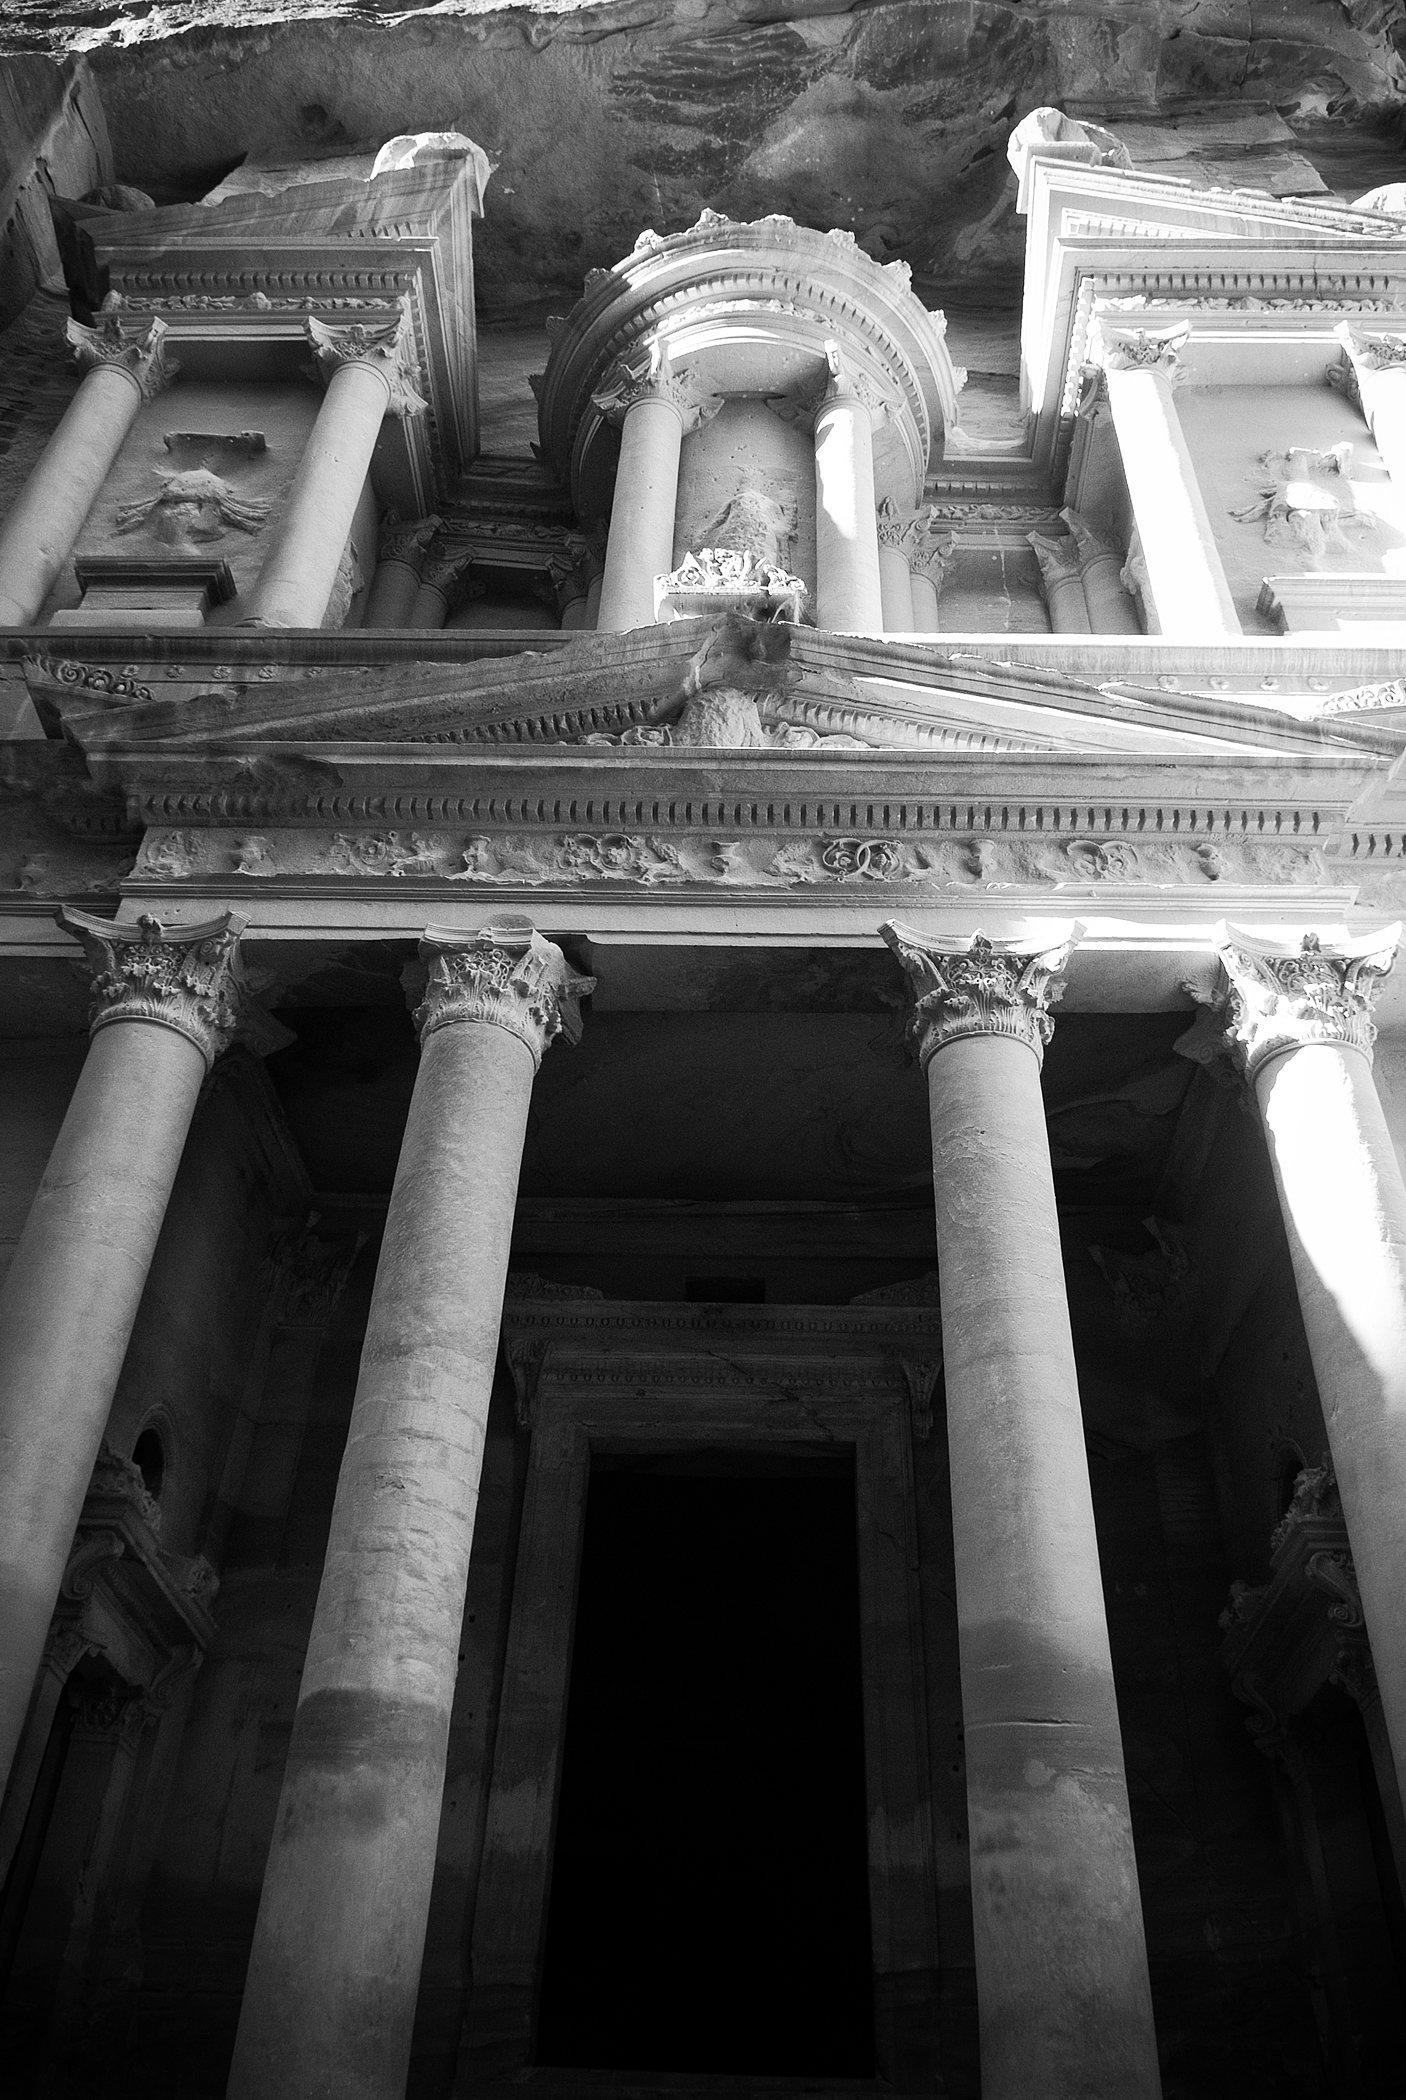 Inside the Treasury